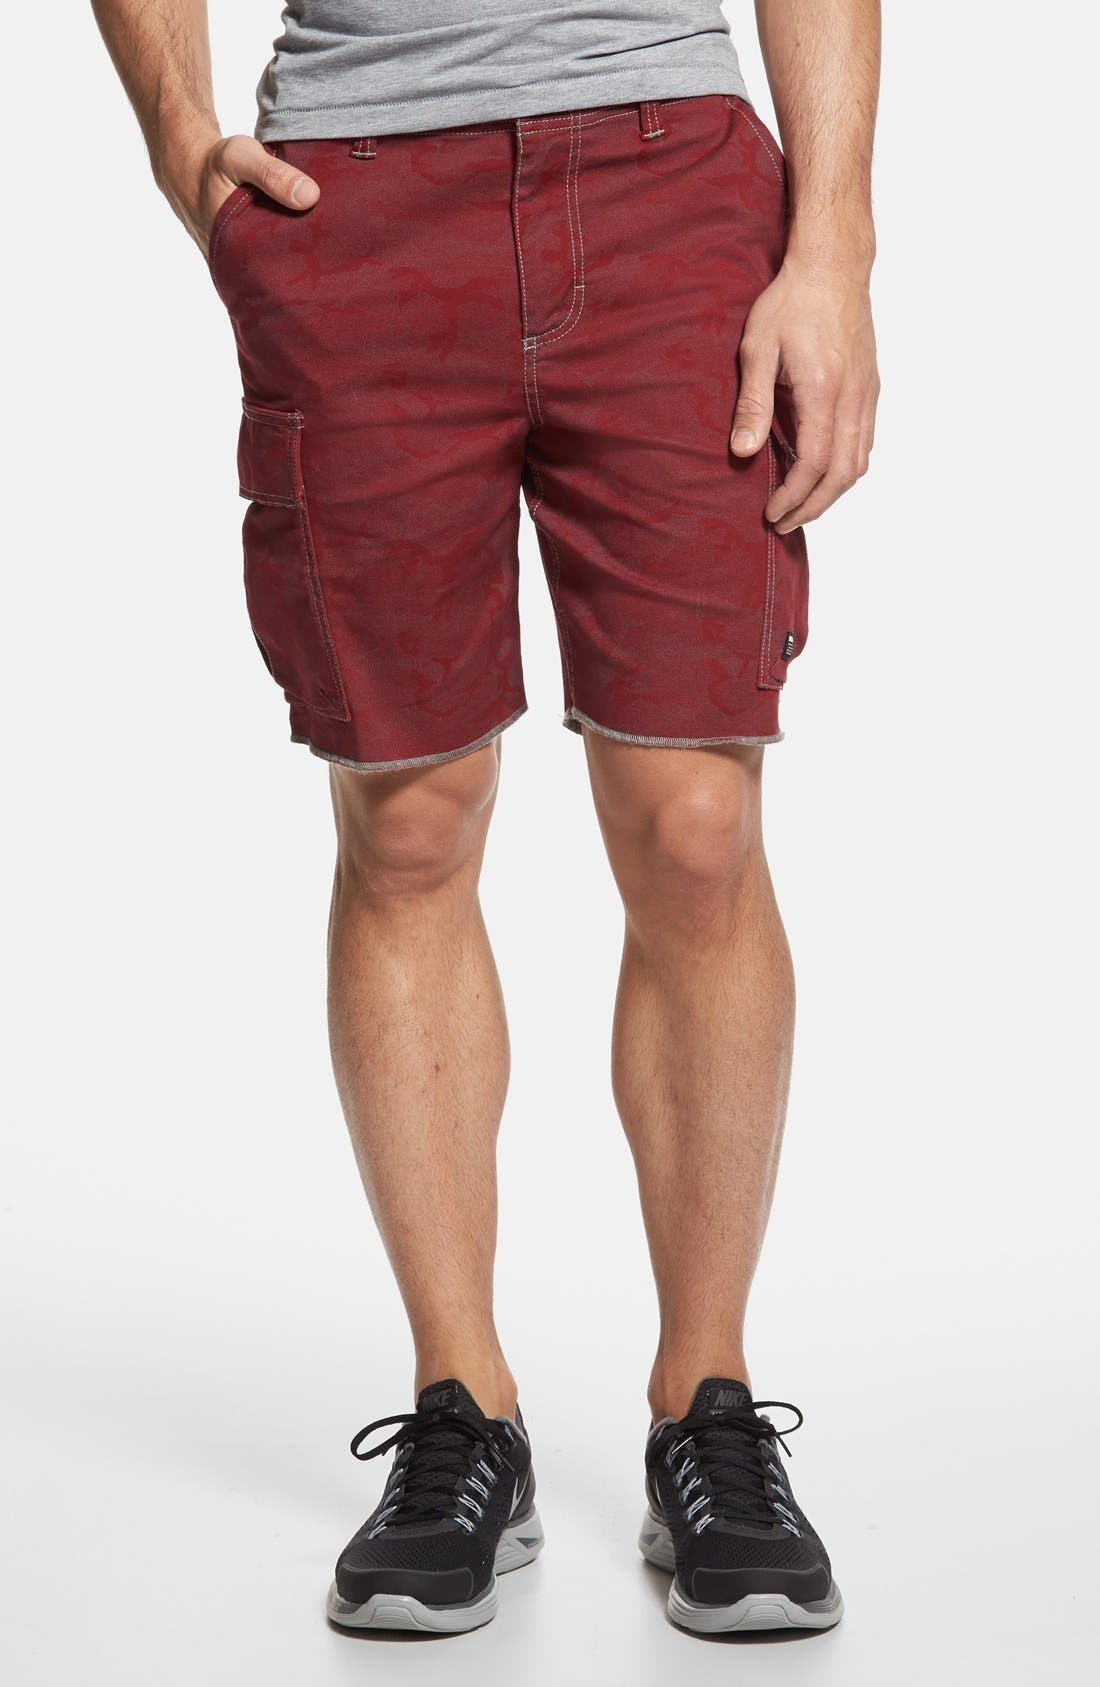 Main Image - Nike SB 'Hawthorne' Camo Cargo Shorts